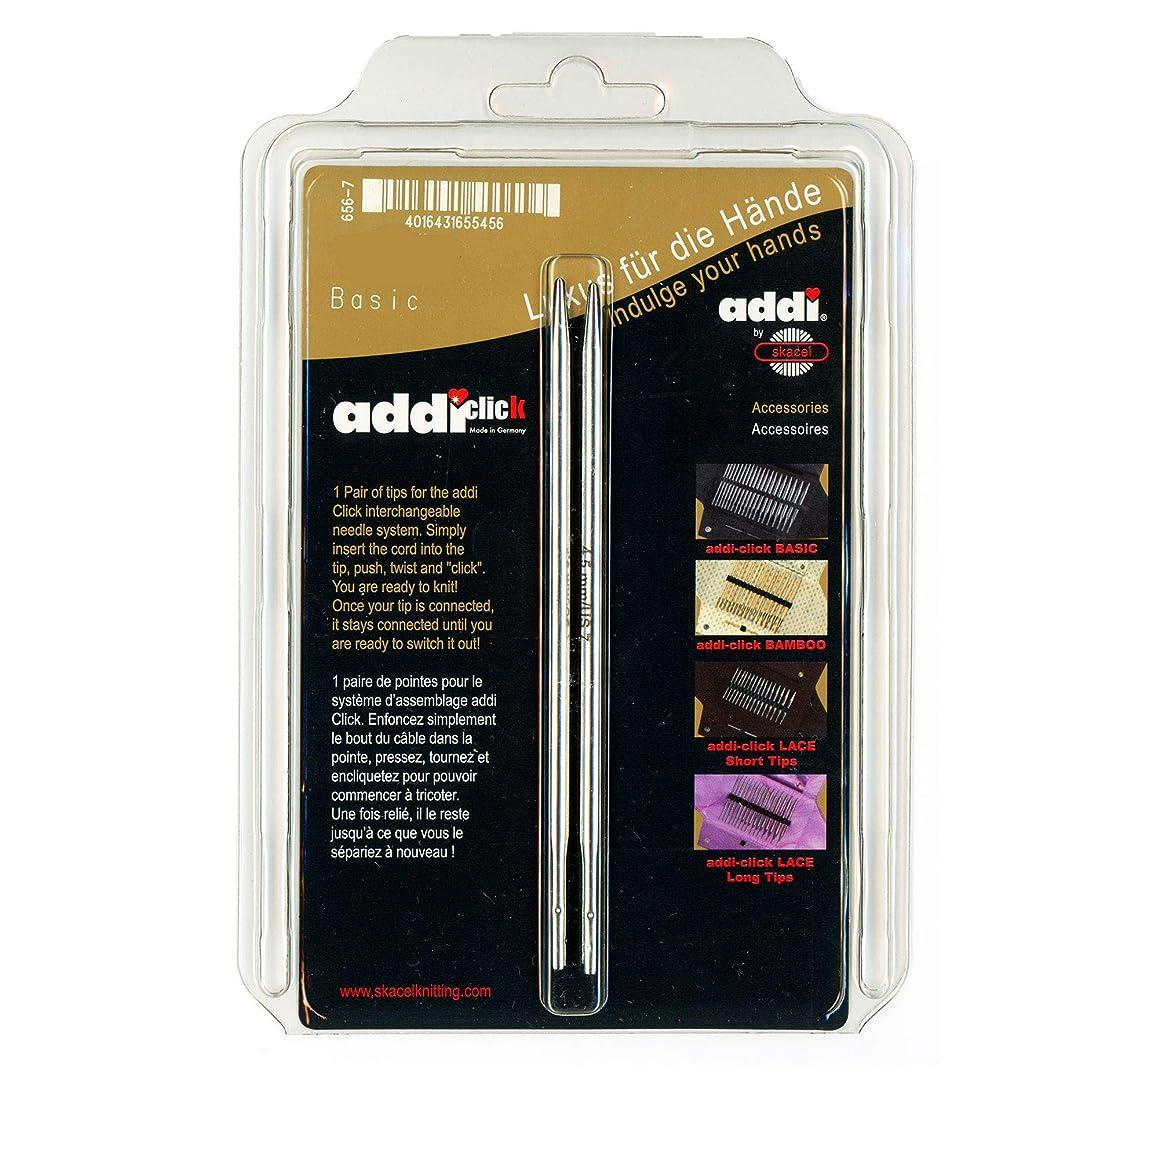 addi Click Interchangeable Knitting Needle Tips Turbo Basic Set 5 inch (13cm) Size US 10.5 (6.5mm)